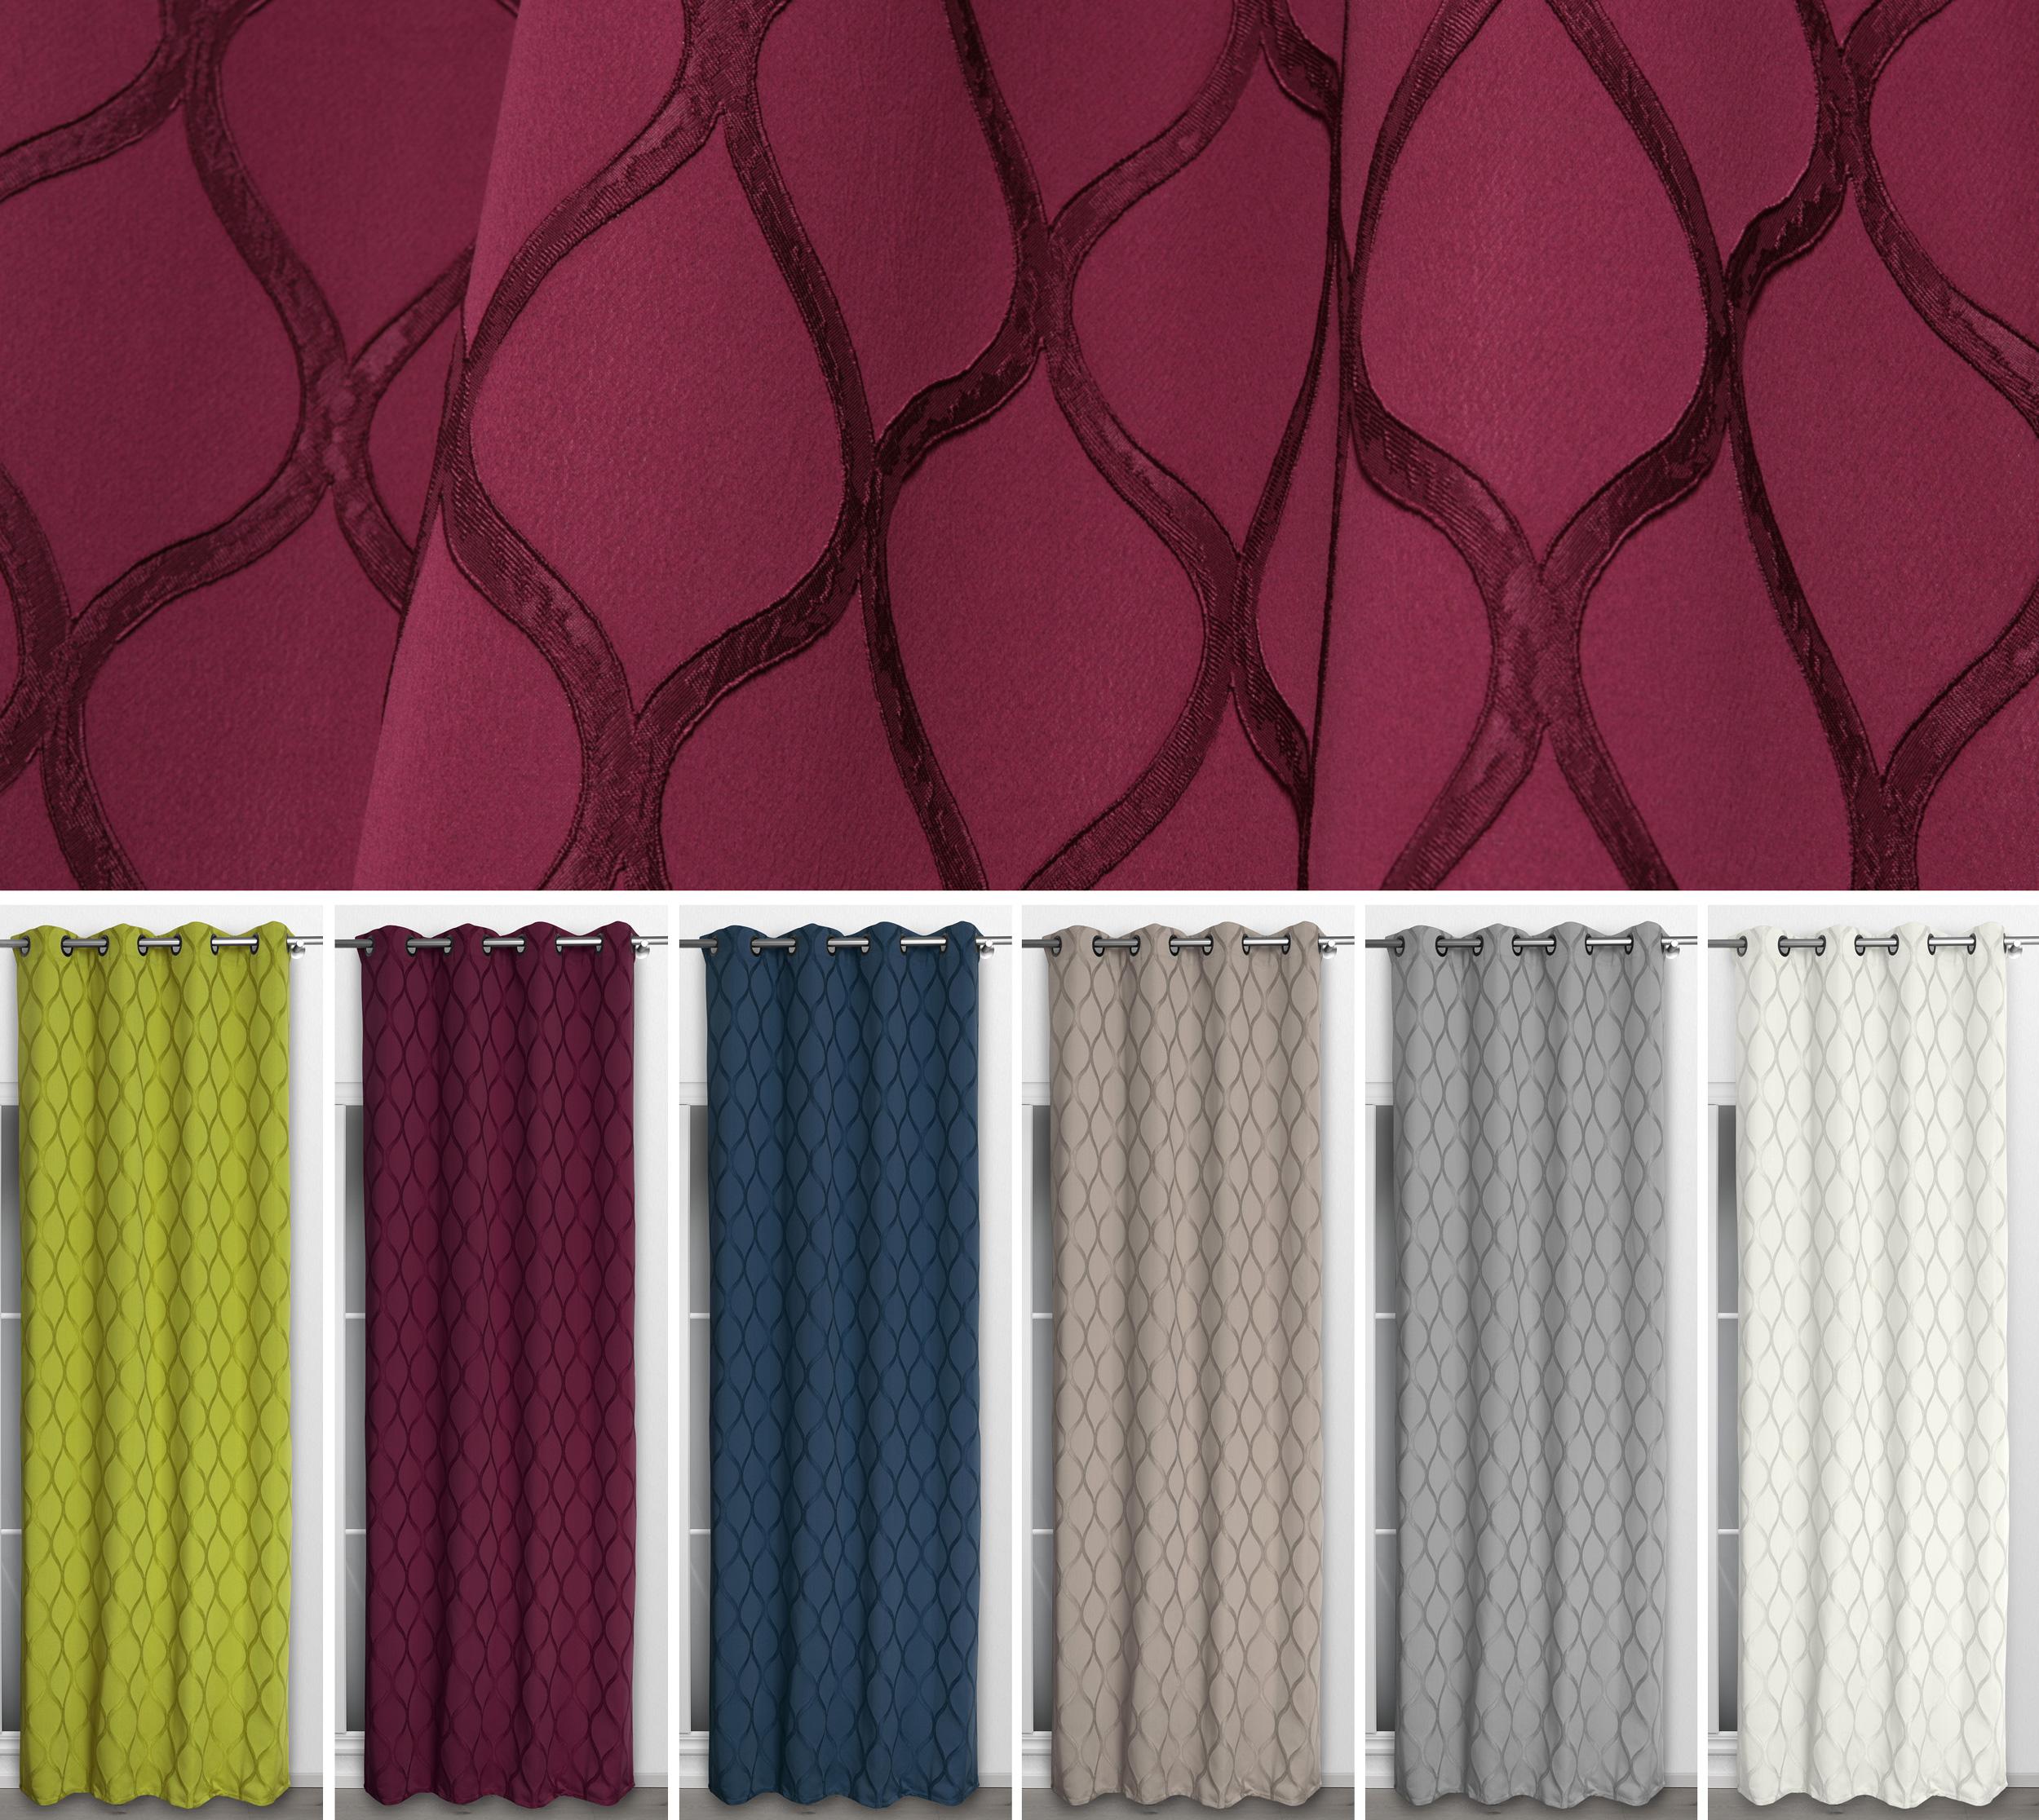 beautex vorhang mit sen 135x260 cm farbe w hlbar. Black Bedroom Furniture Sets. Home Design Ideas